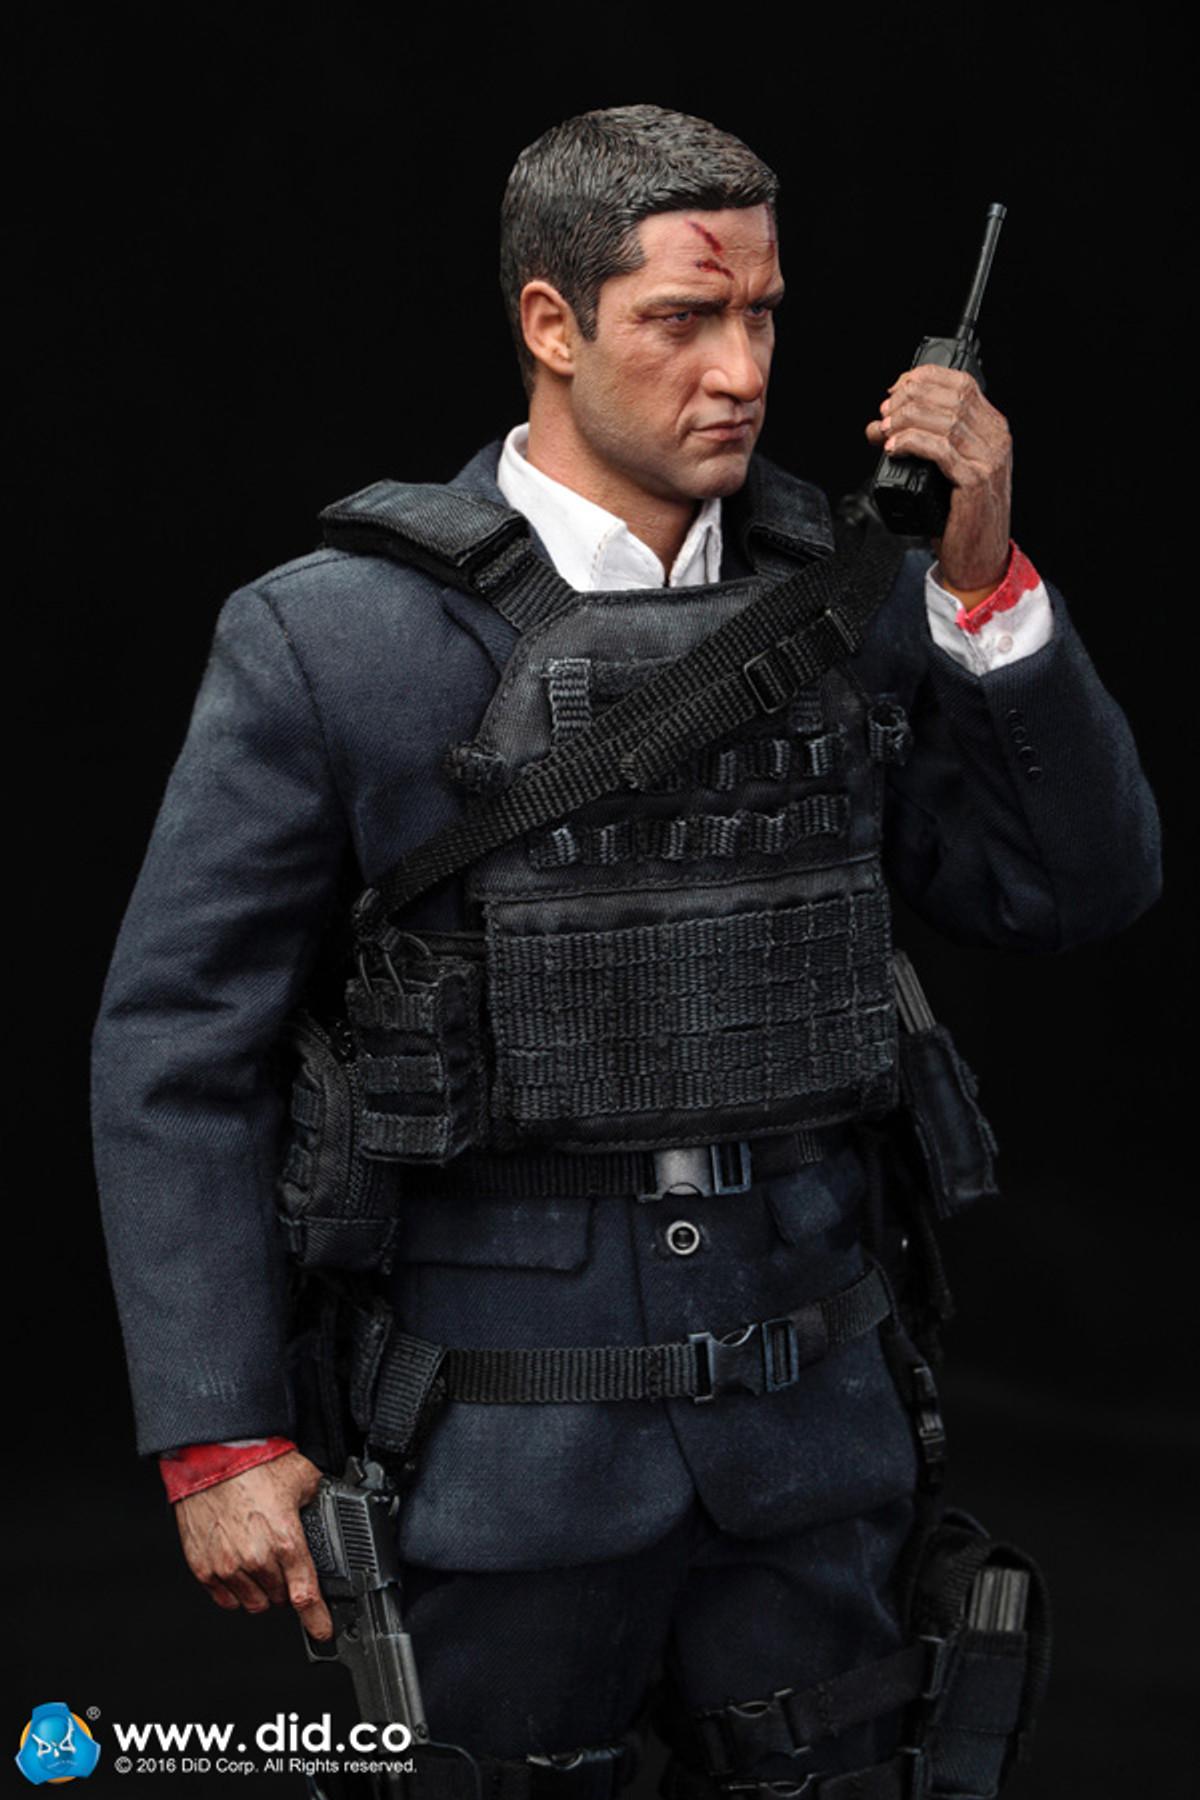 1//6 Scale Black Socks DID Action Figures Mark Secret Service